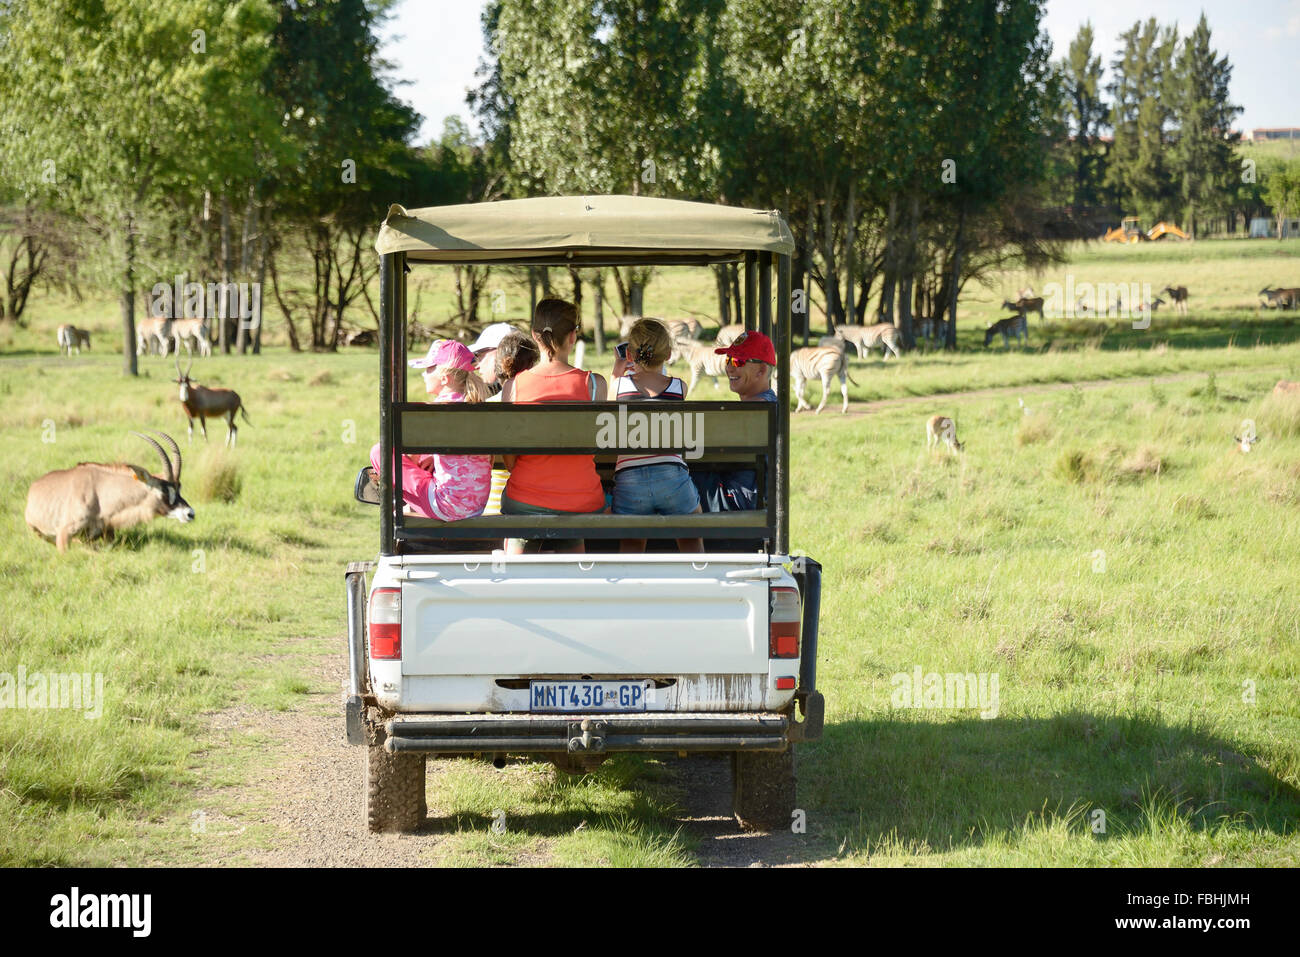 Safari-Jeep, Tier-Welt-Wildpark, Emerald Resort & Casino, Vanderbijlpark, Emfuleni Gemeinde, Gauteng, Südafrika Stockbild